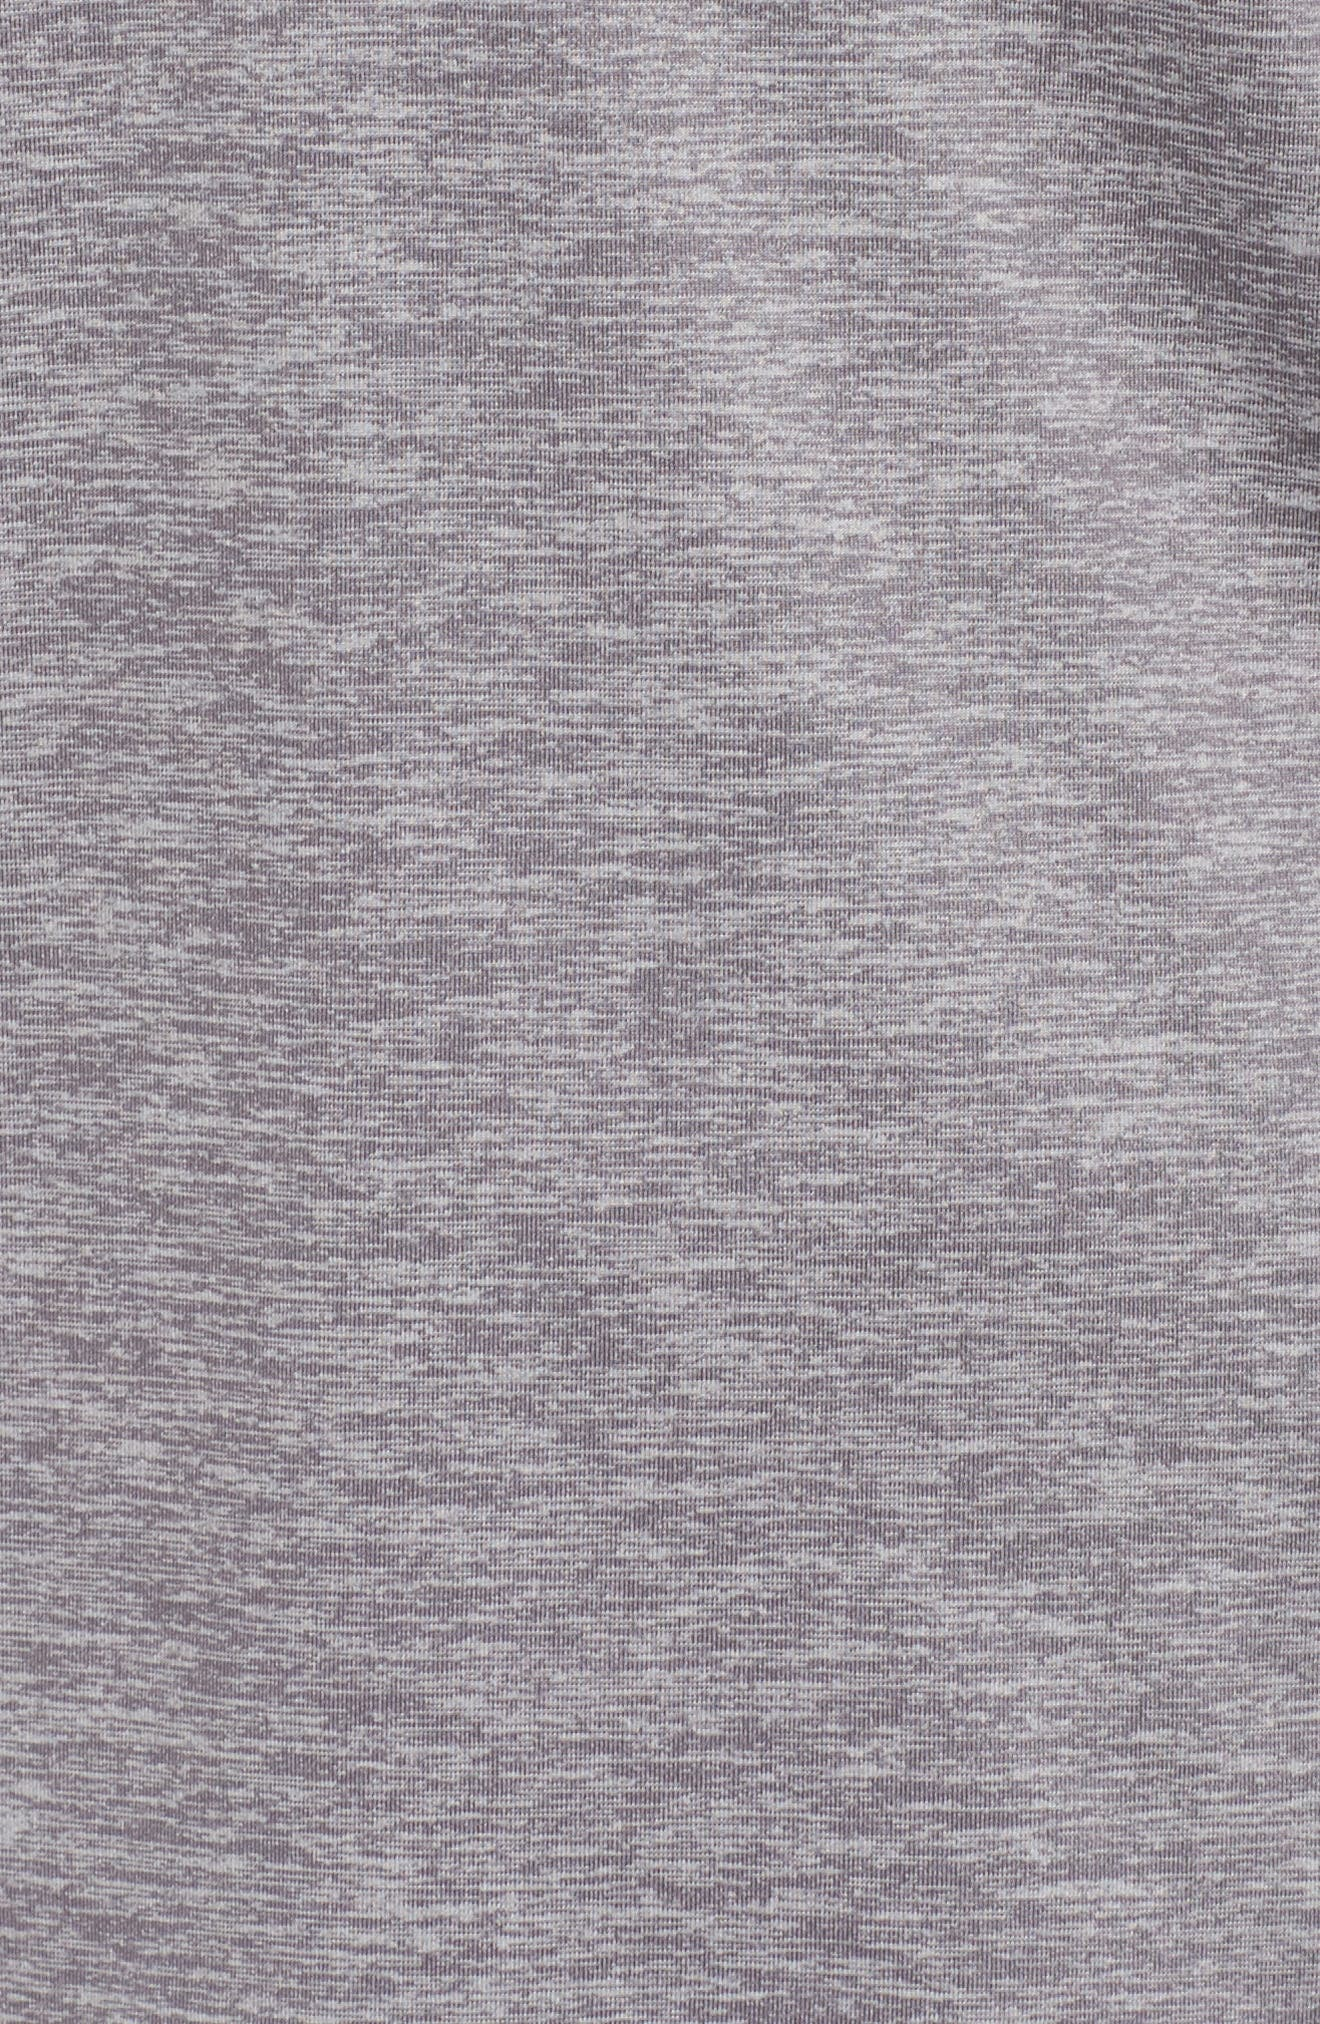 Dry Element Long Sleeve Top,                             Alternate thumbnail 6, color,                             Gunsmoke/ Atmosphere Grey